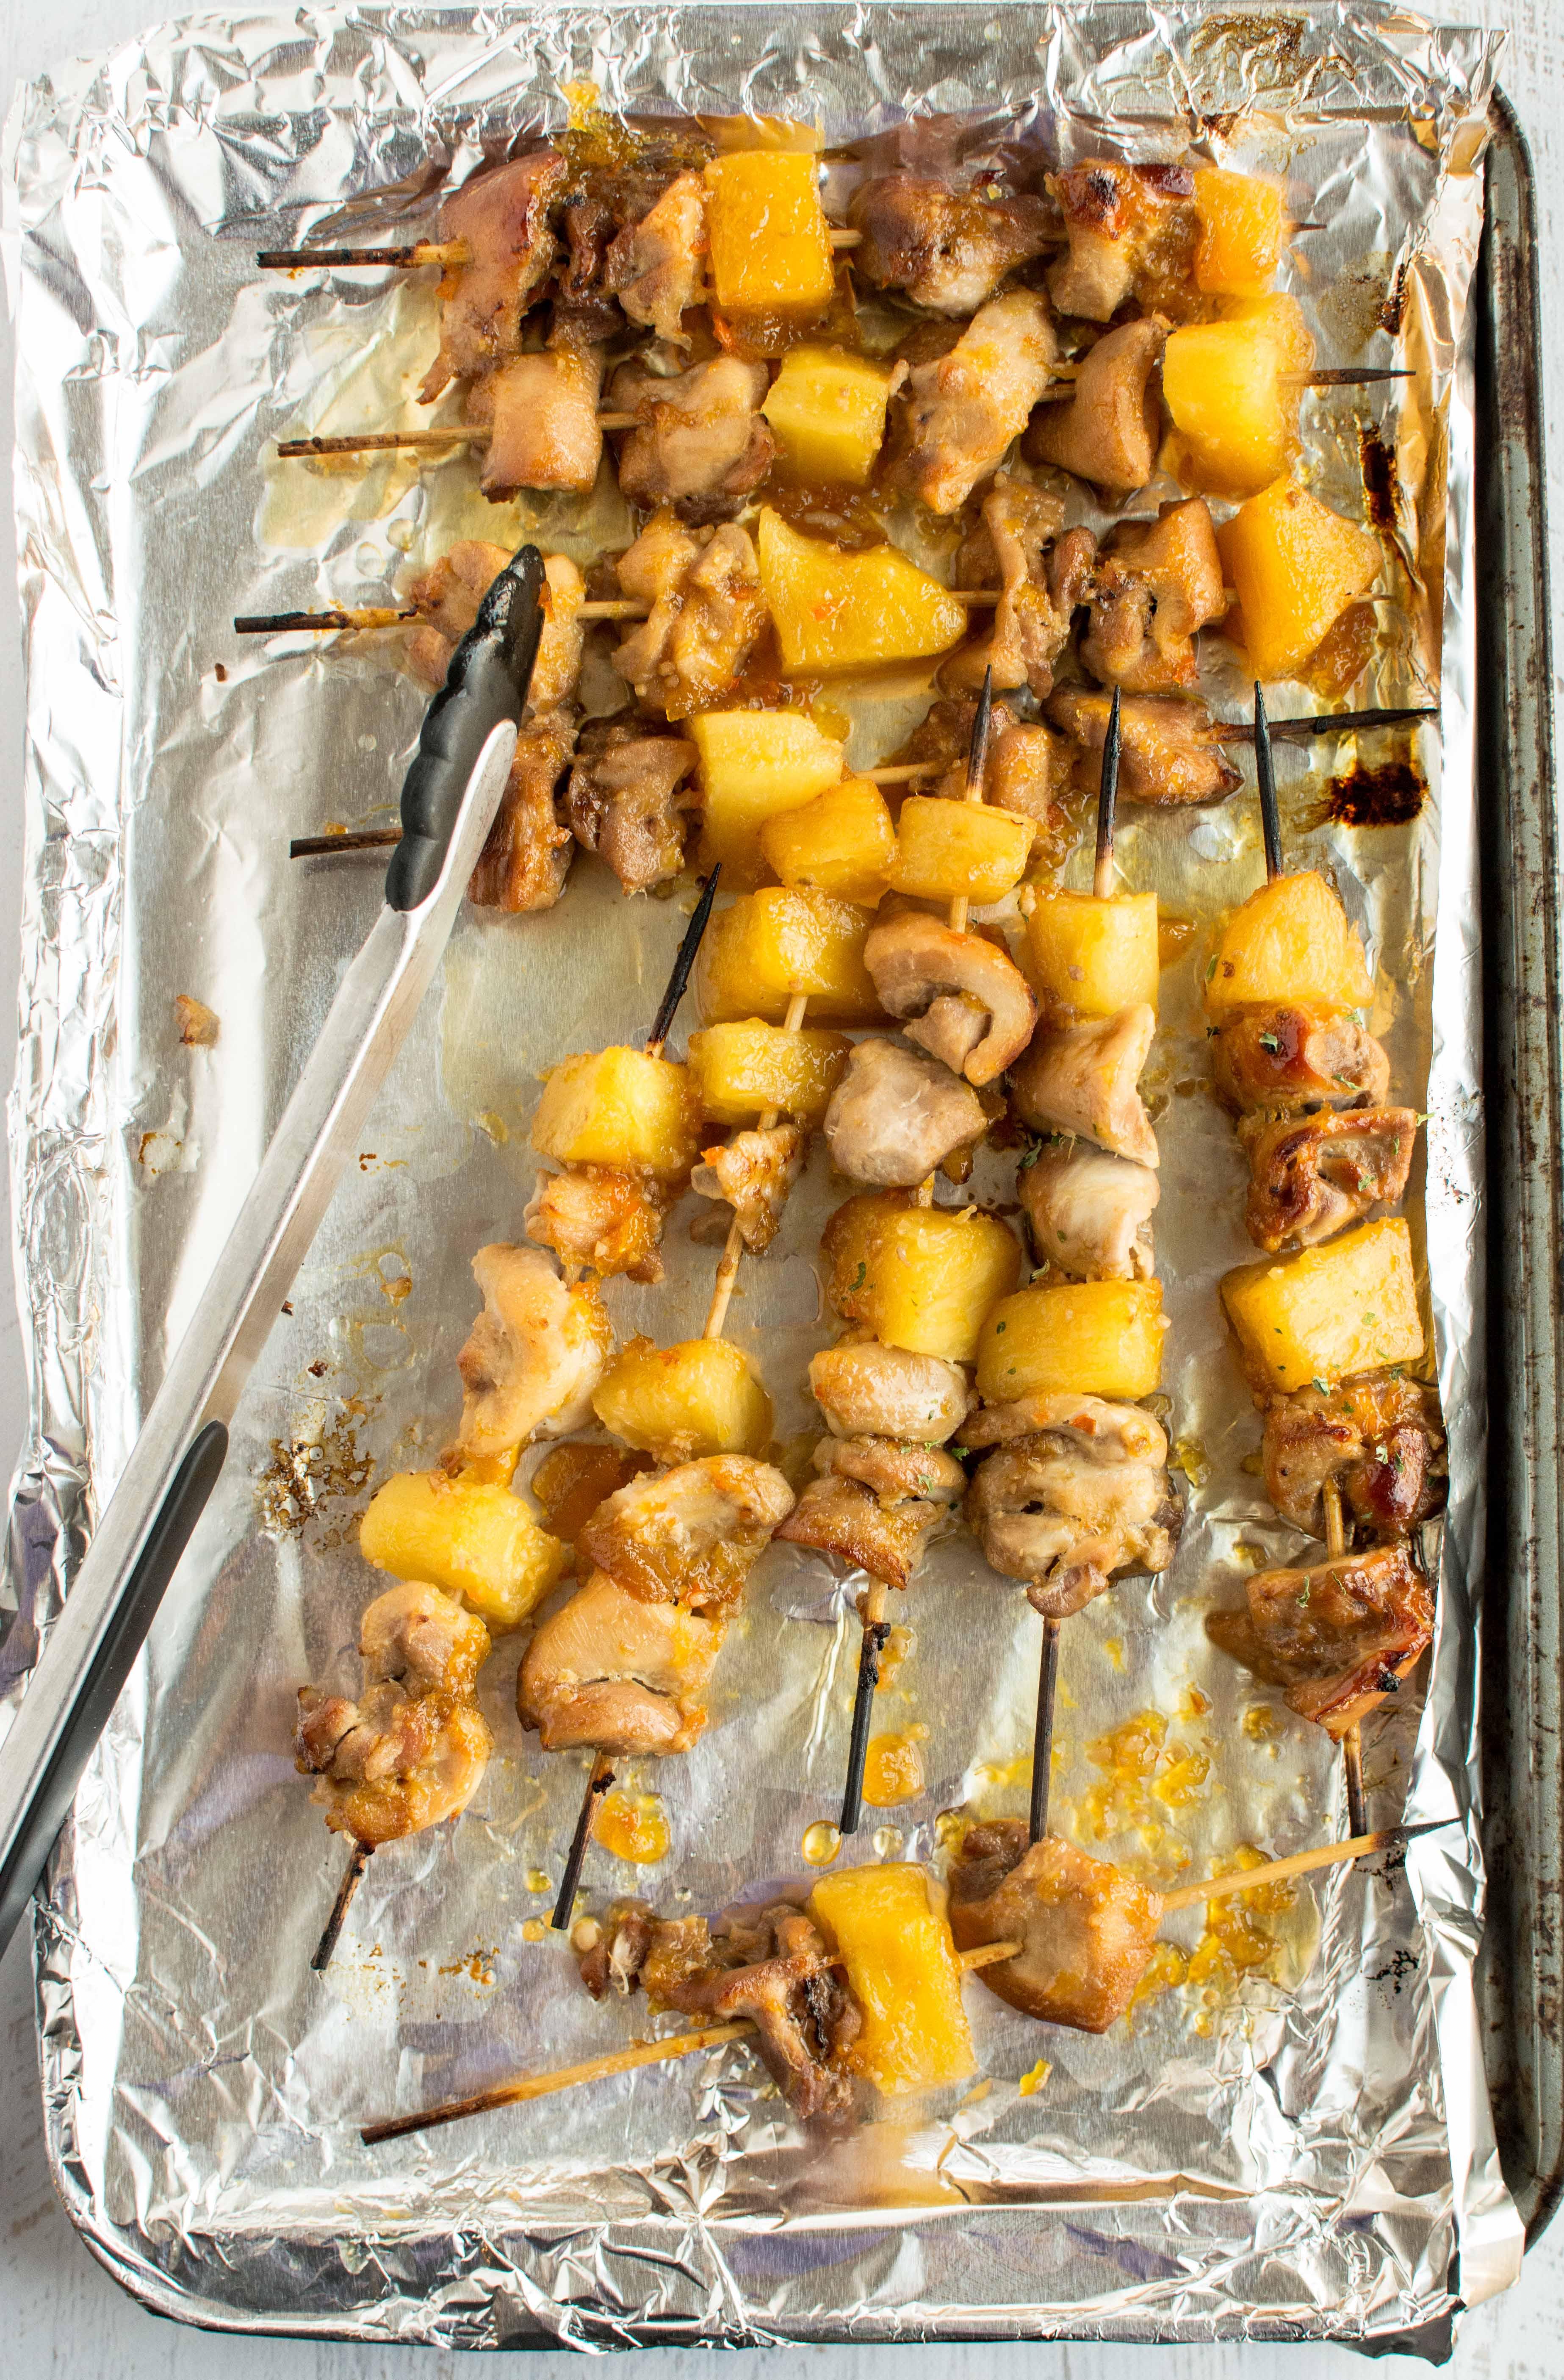 http://slowcookergourmet.net/2014/07/08/crockpot-cheesy-buffalo-chicken-pasta/